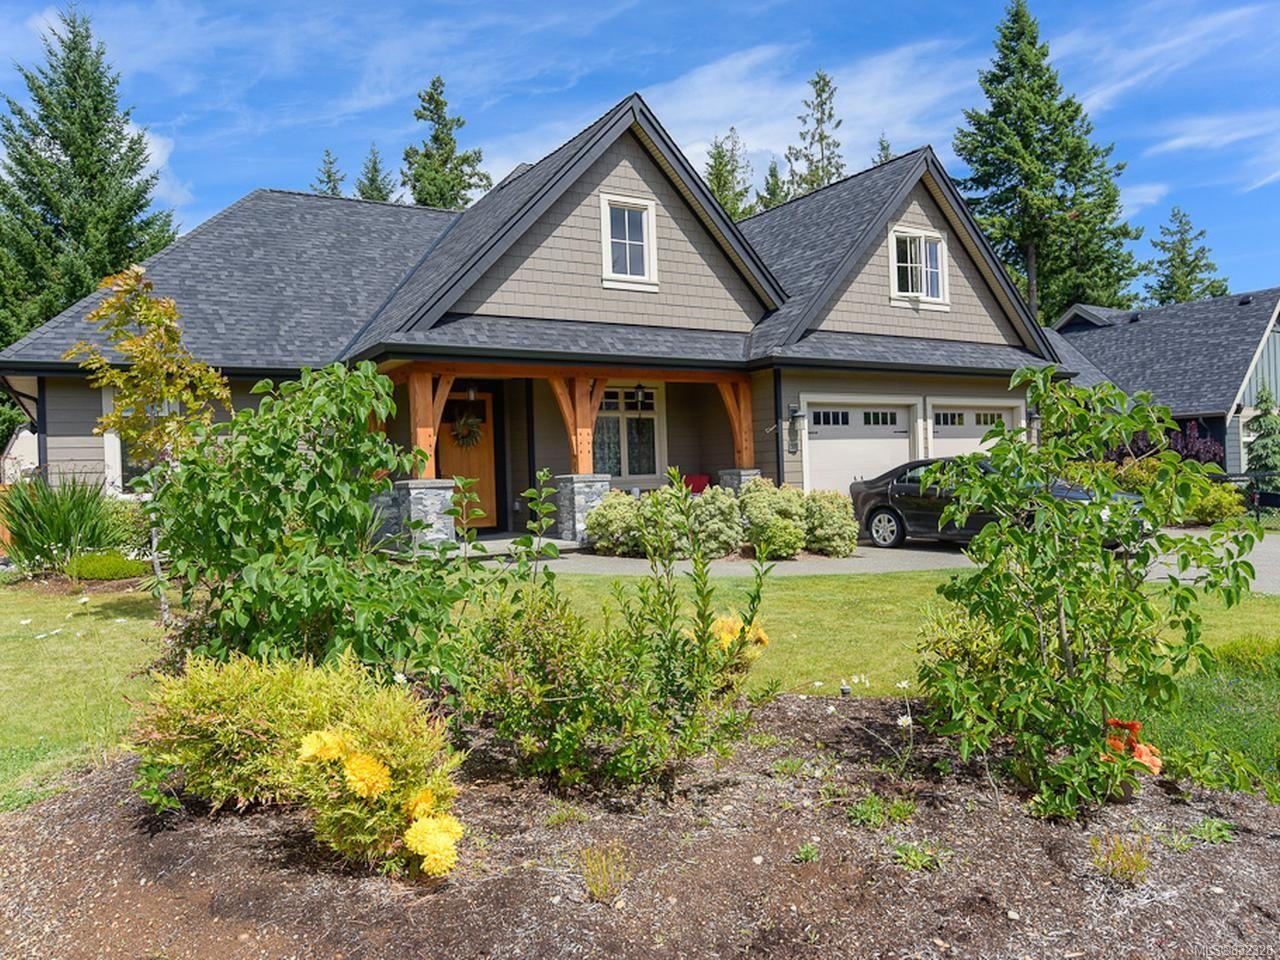 Main Photo: 2898 Cascara Cres in COURTENAY: CV Courtenay East House for sale (Comox Valley)  : MLS®# 832328